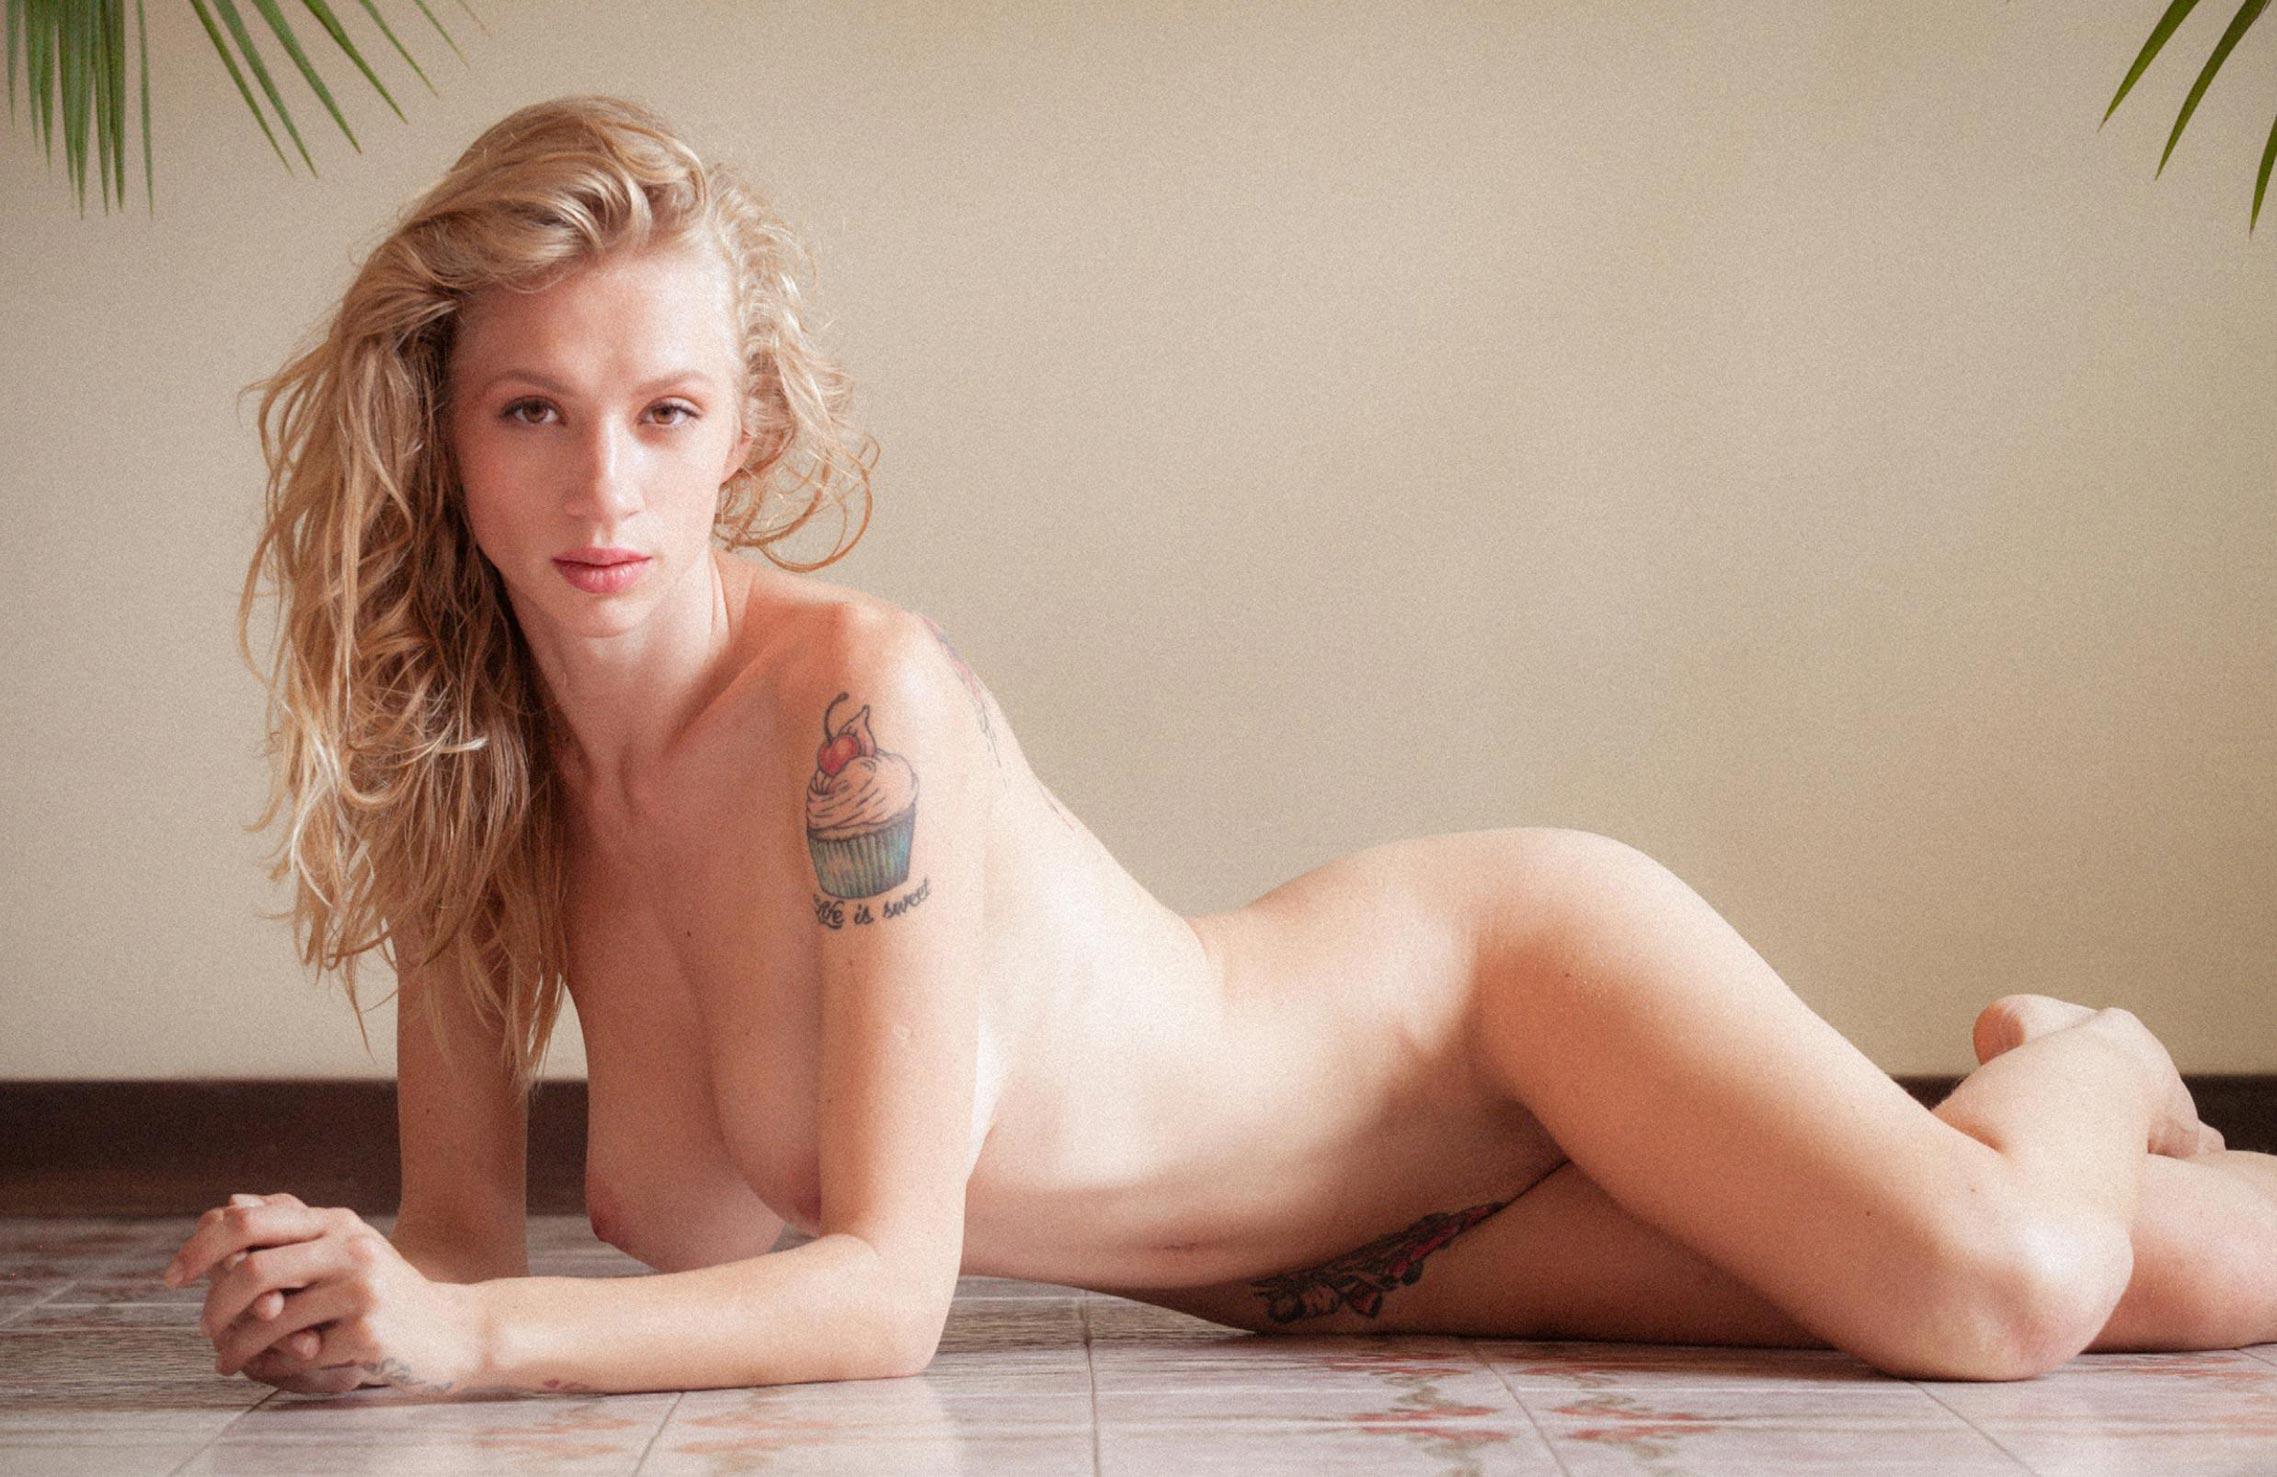 Наташа Легейда / Natasha Legeyda nude by Ami Elsius - Volo Magazine november 2017